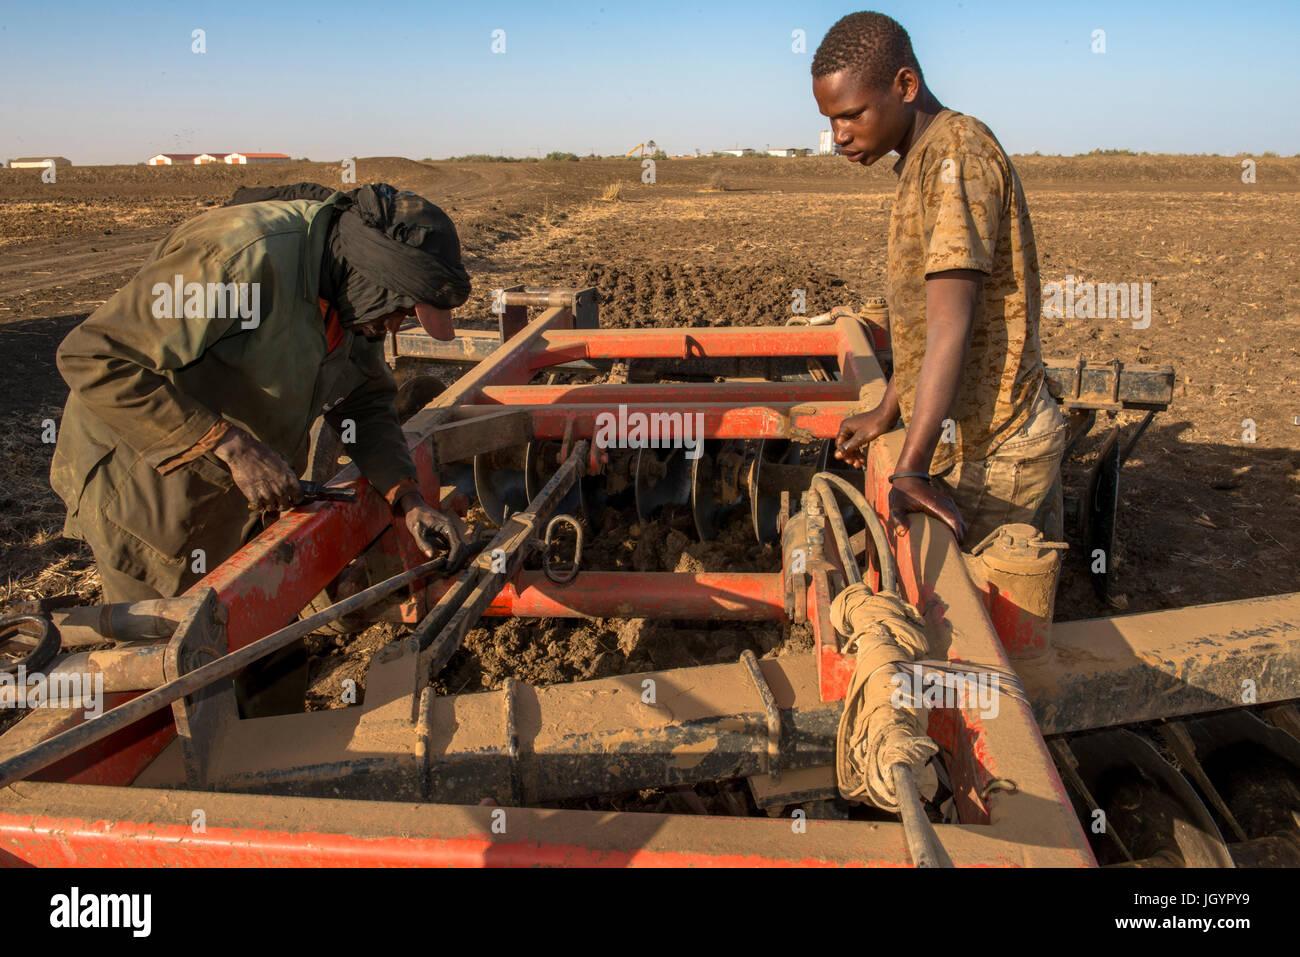 Mechanic repairing farming equipment. Senegal. Stock Photo